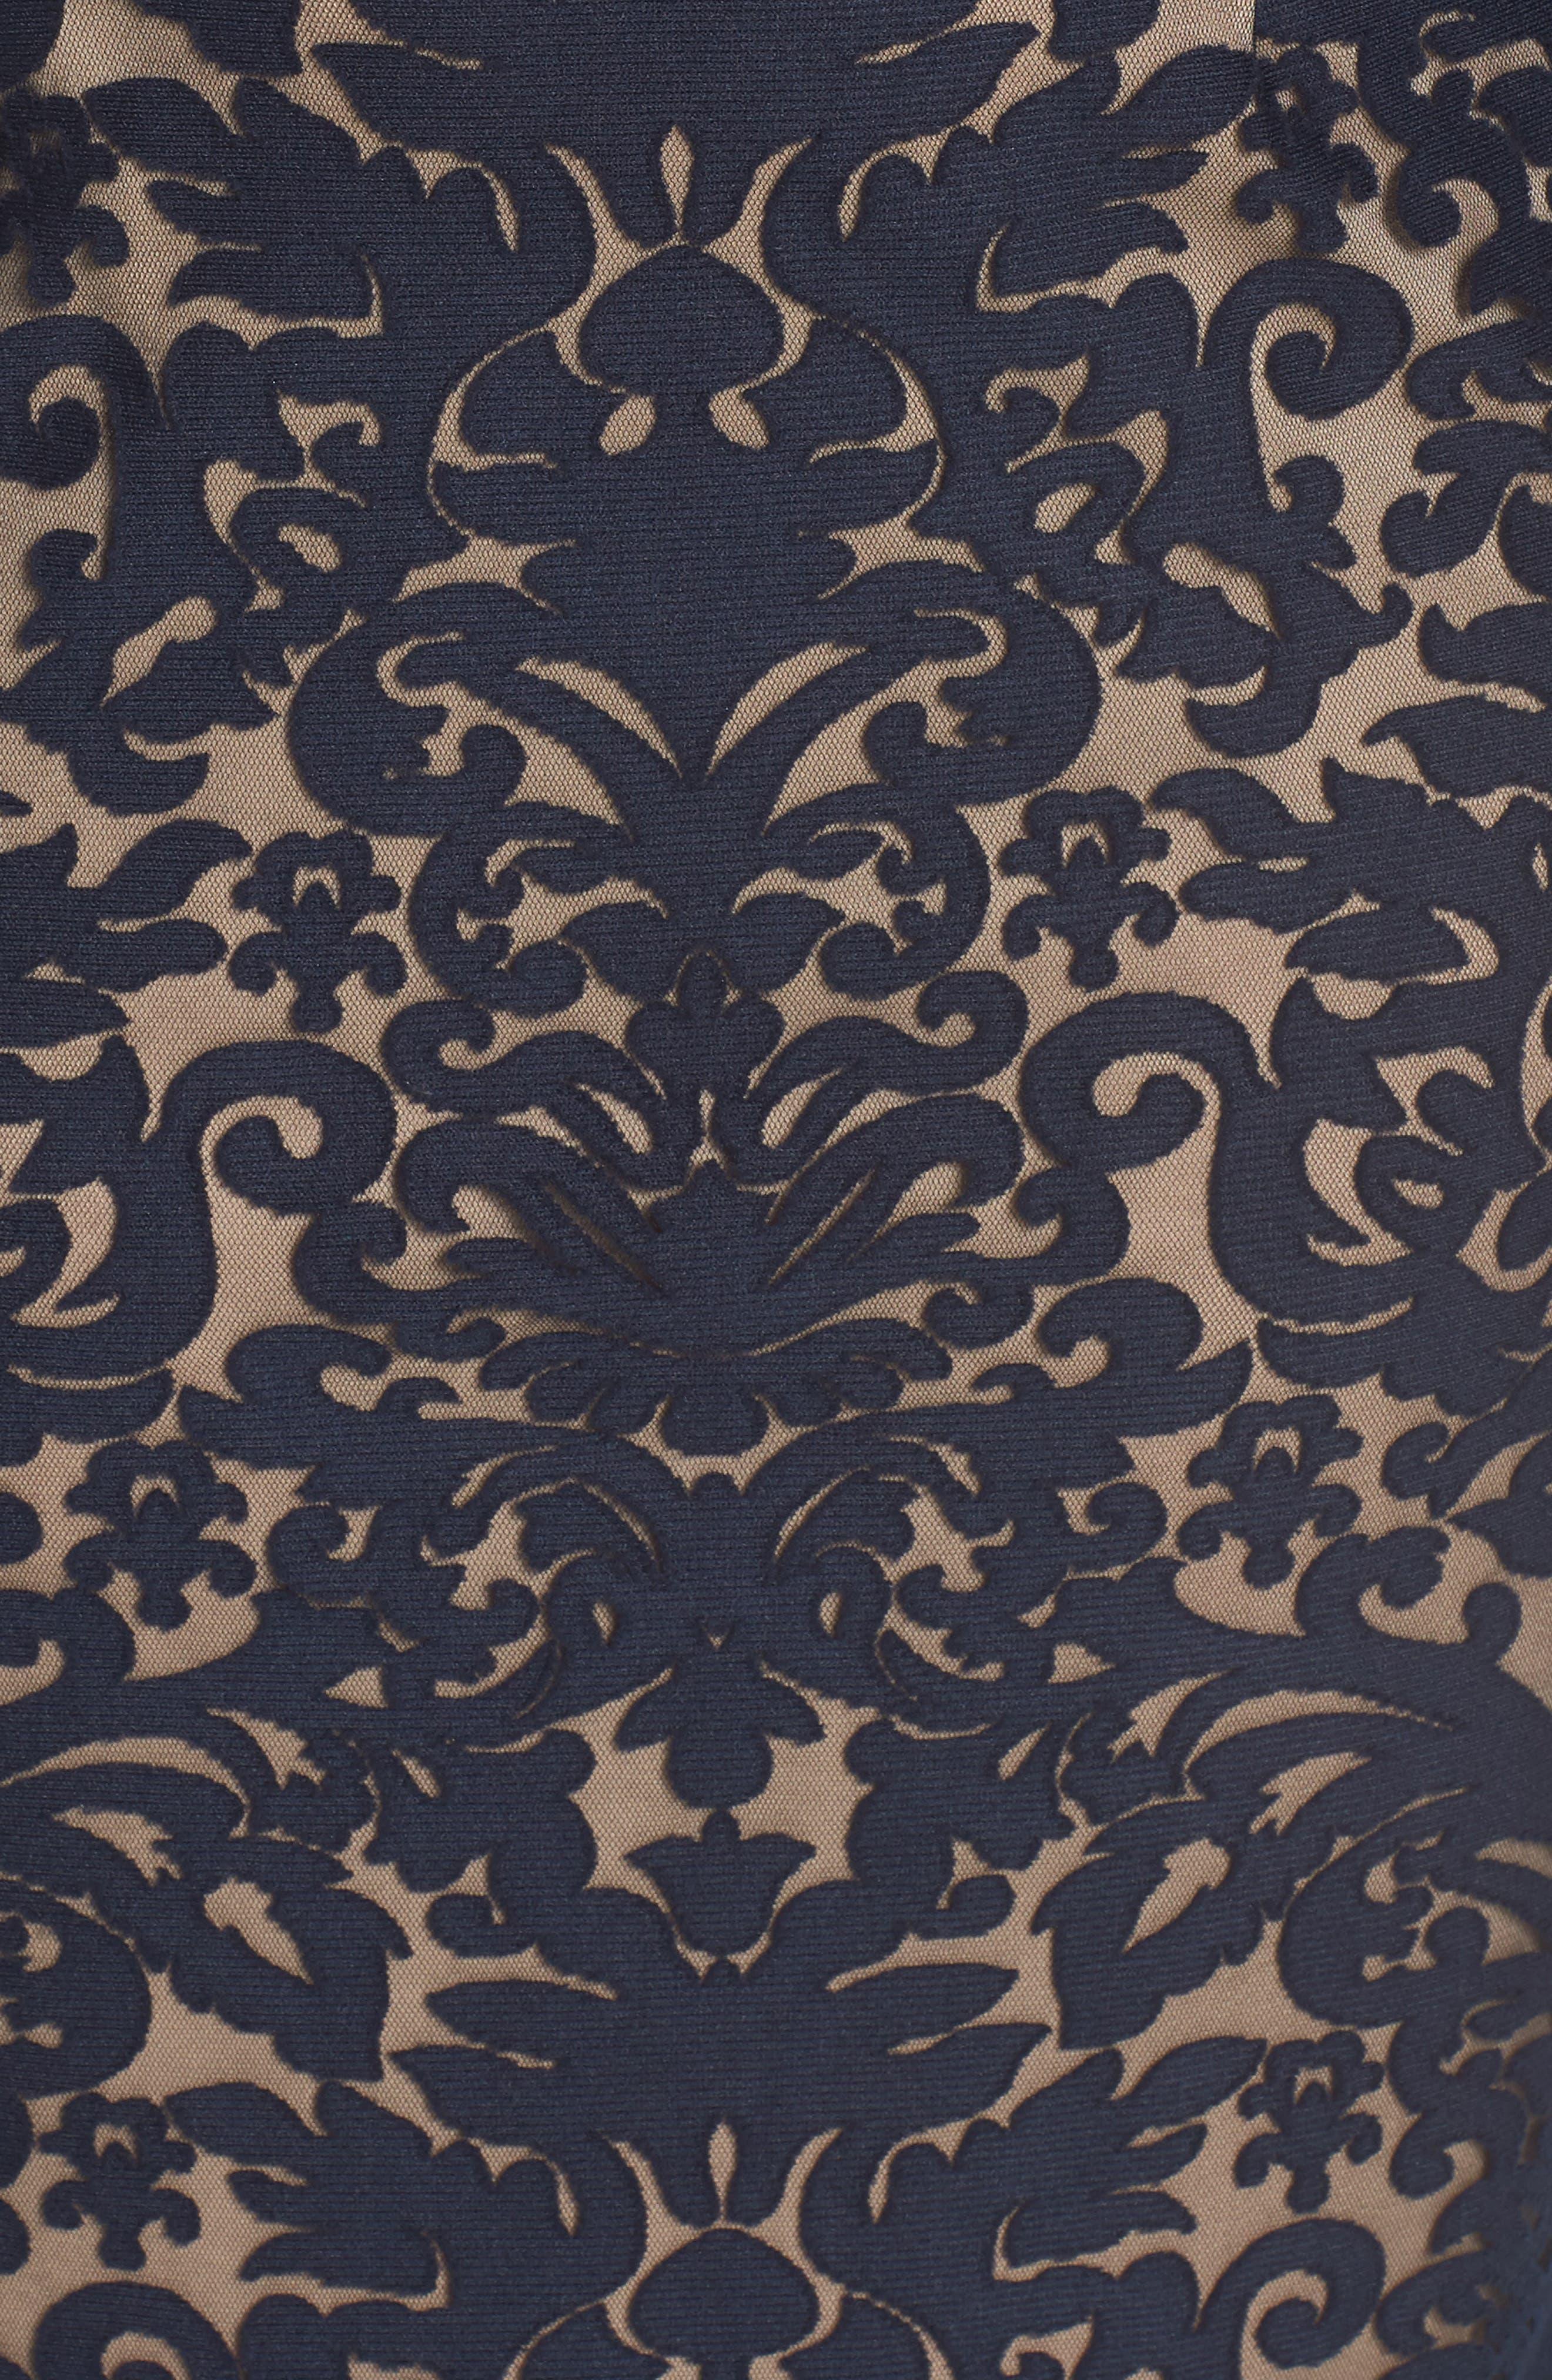 Bell Sleeve Off the Shoulder Burnout Lace Dress,                             Alternate thumbnail 5, color,                             401